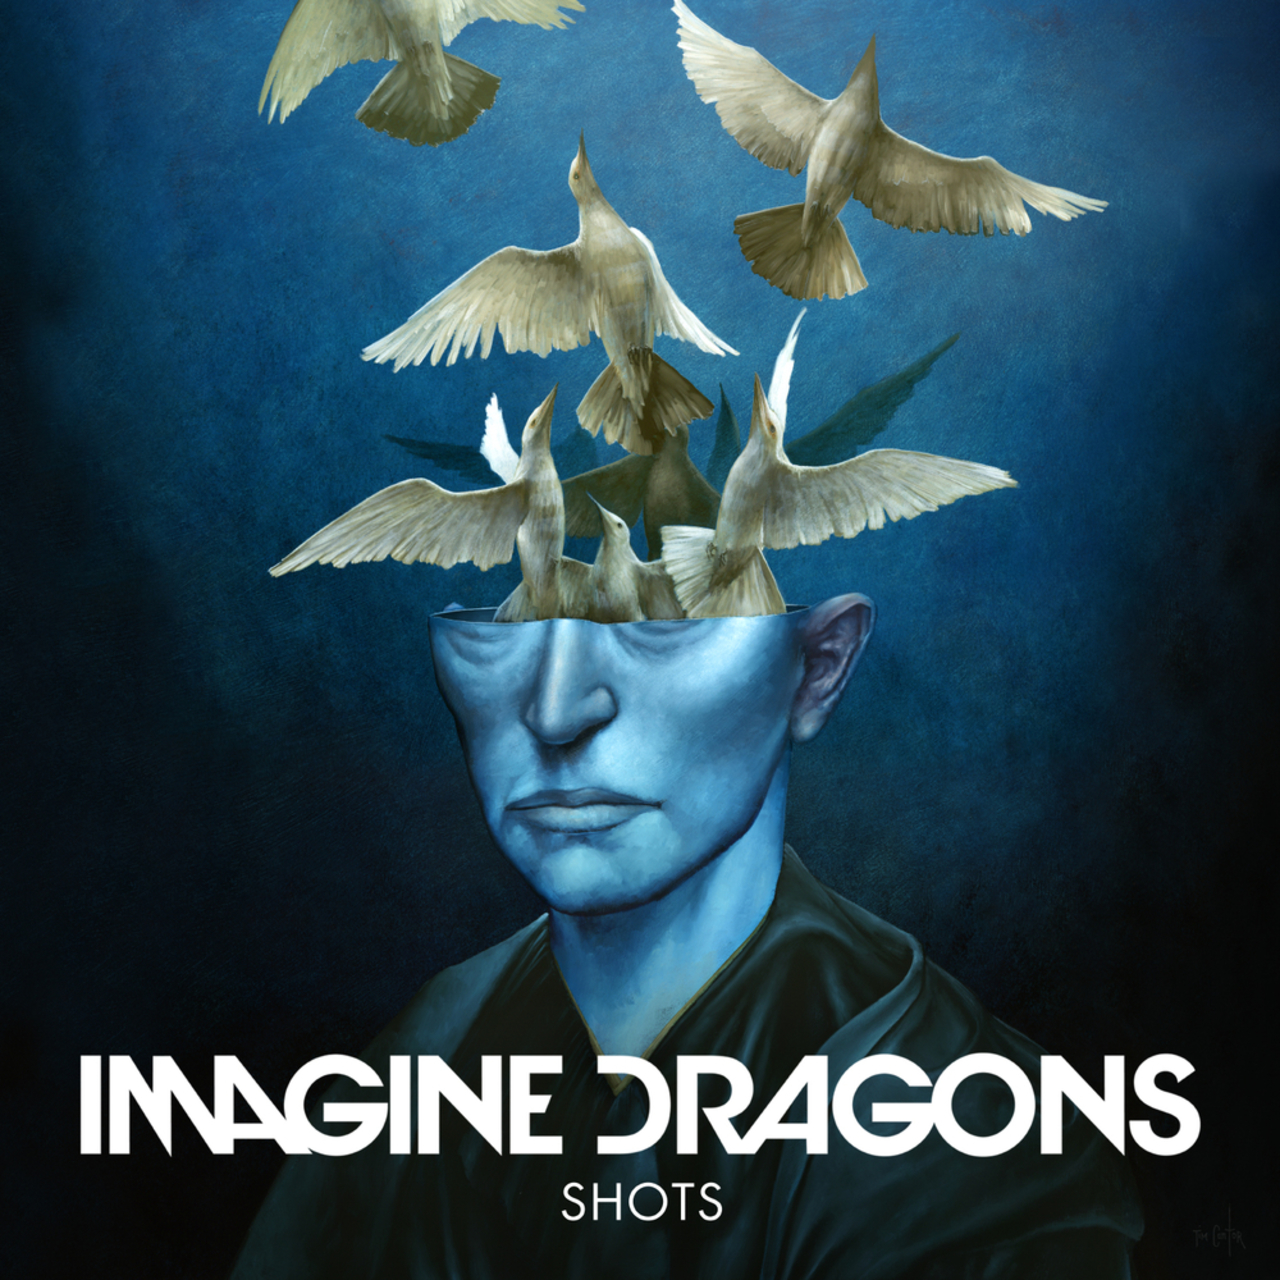 Imagine Dragons - Shots [Astrolith Remix] [Interscope]